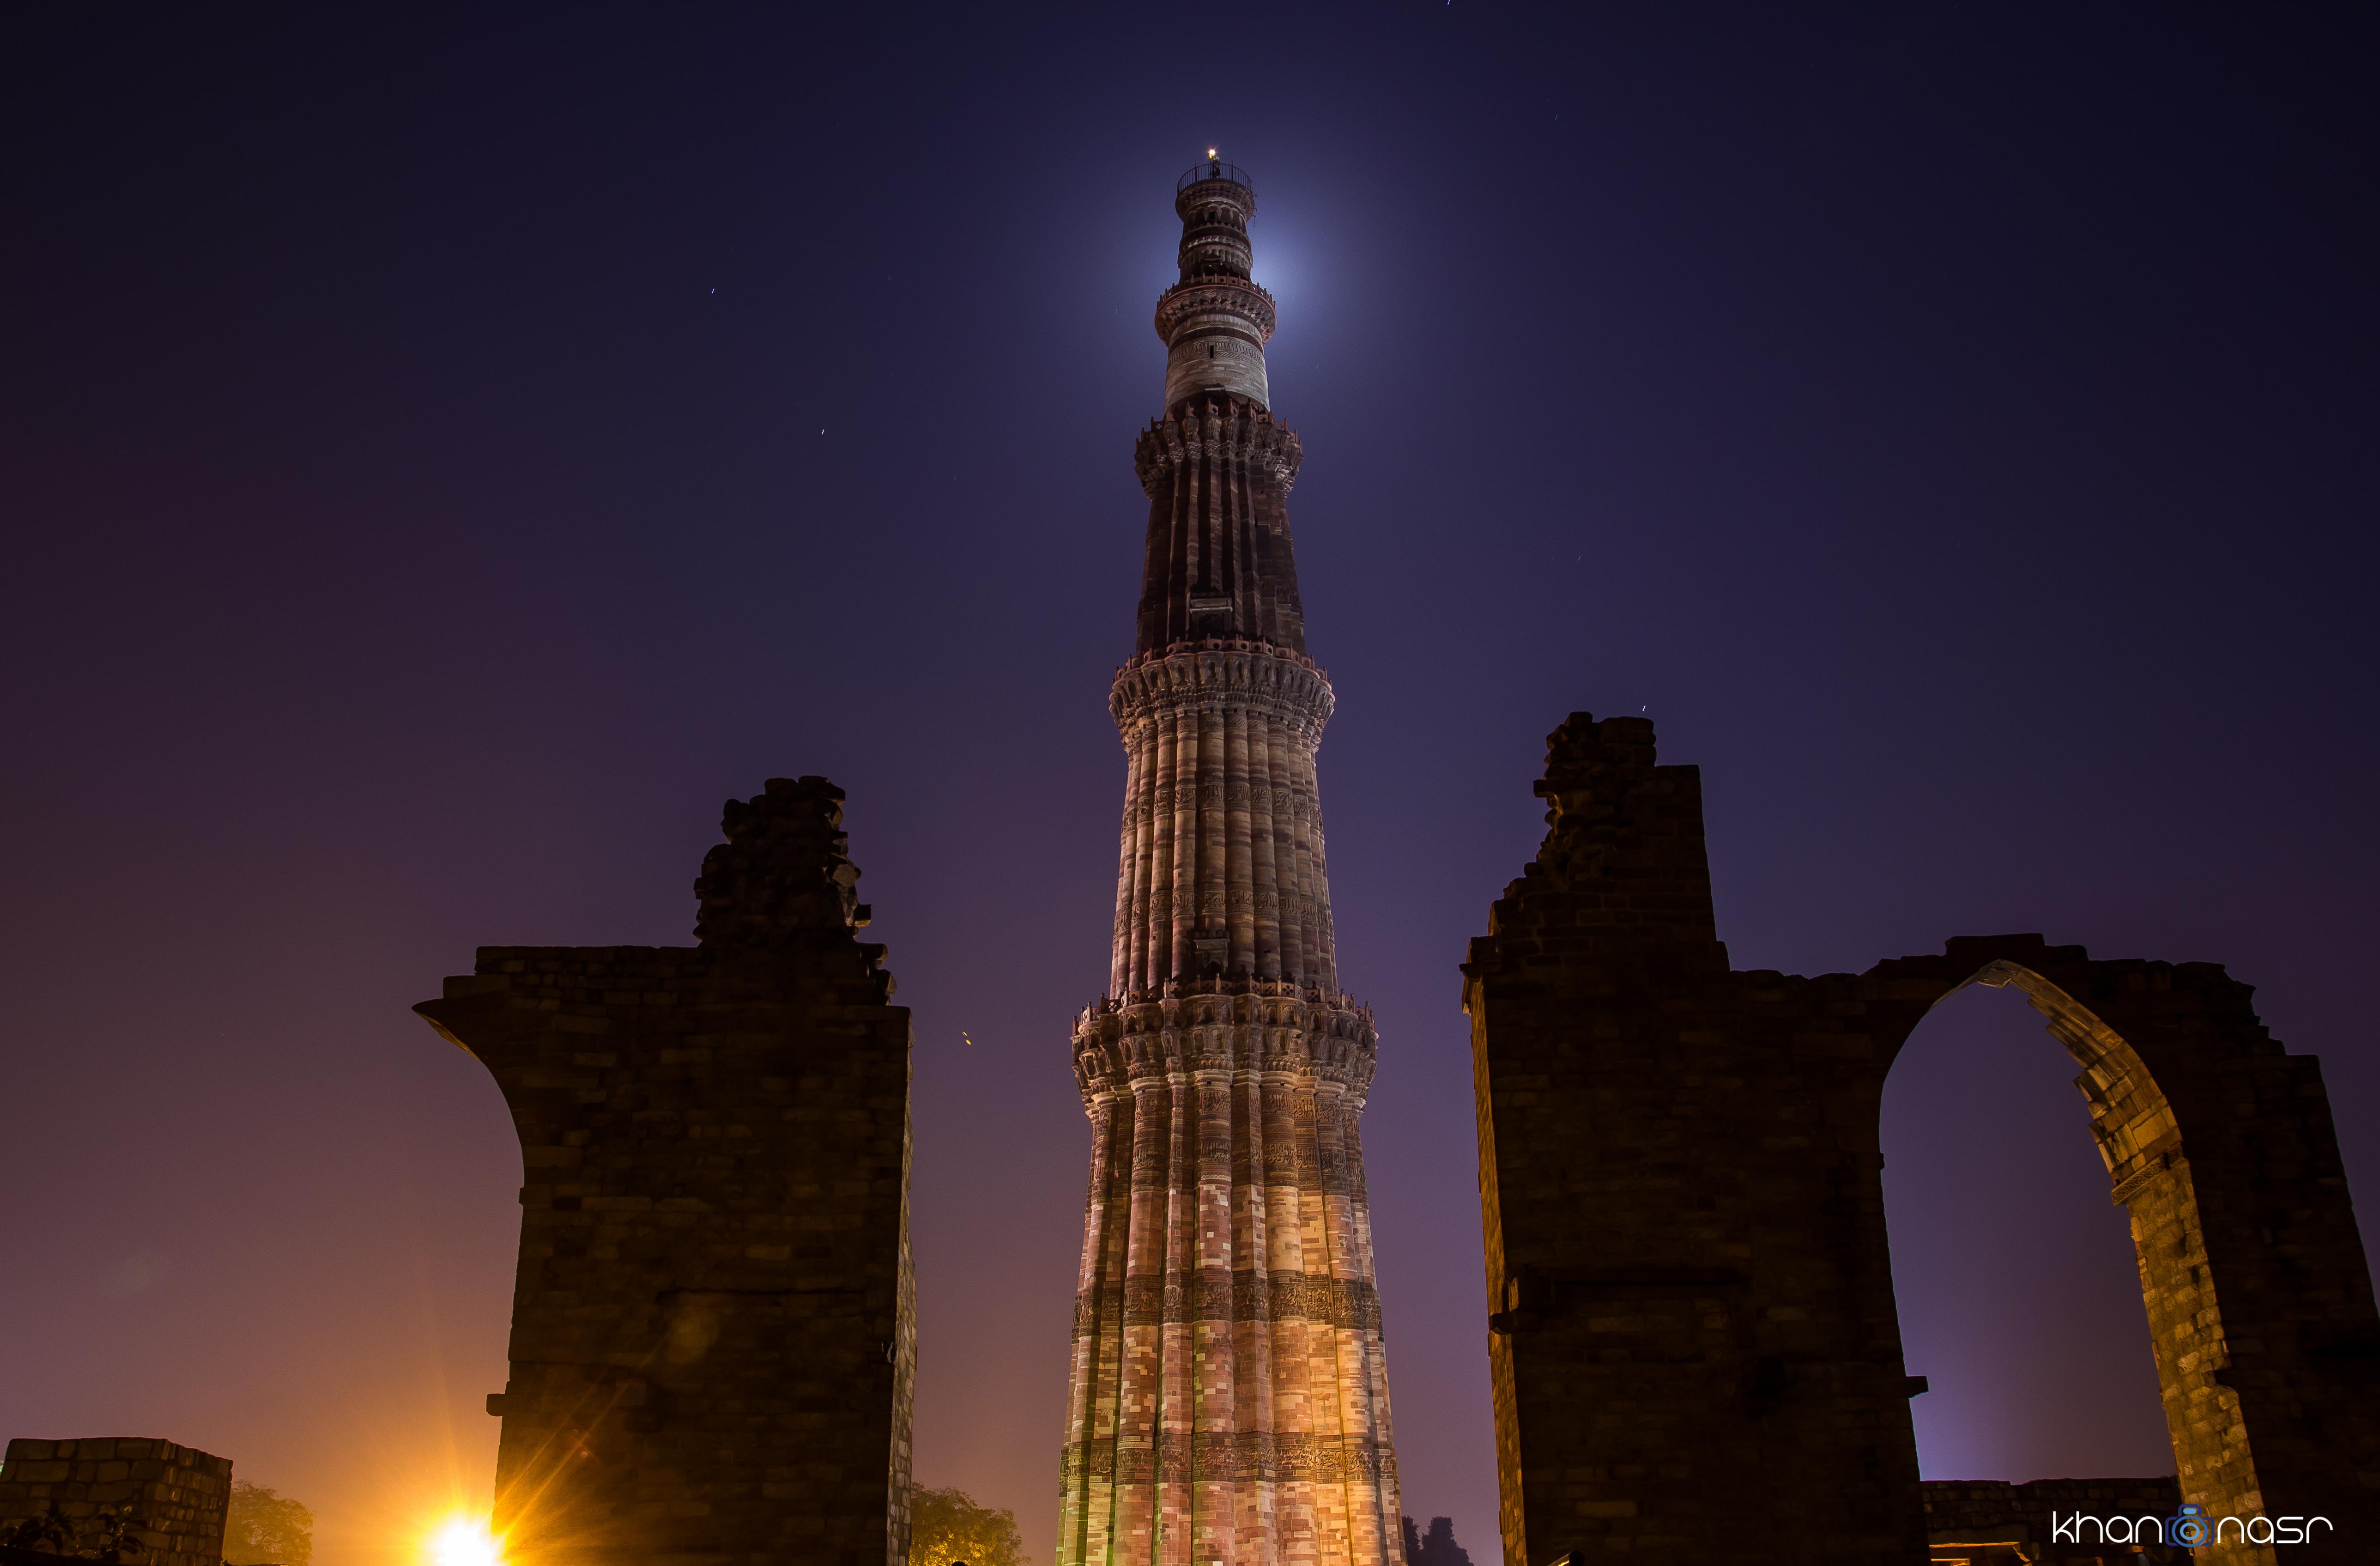 File:Qutab Minar at Night jpg - Wikimedia Commons